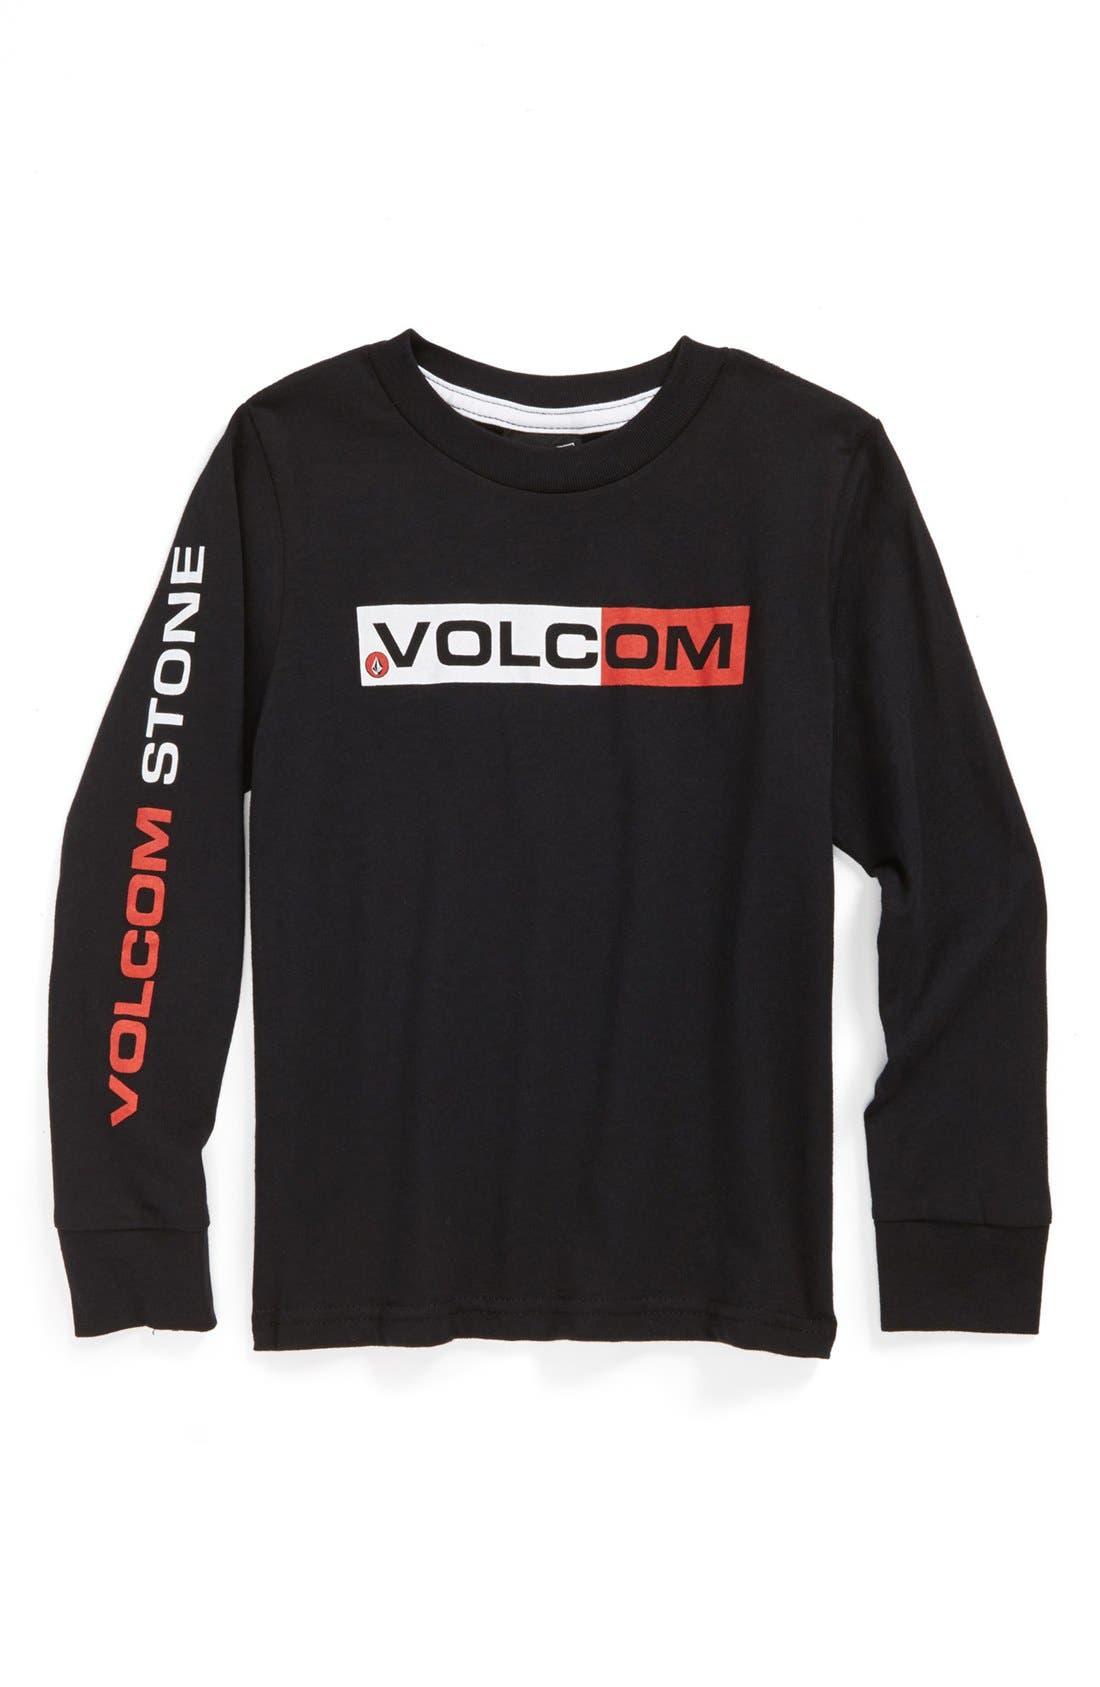 Alternate Image 1 Selected - Volcom 'Euro Styling' Long Sleeve T-Shirt (Big Boys)